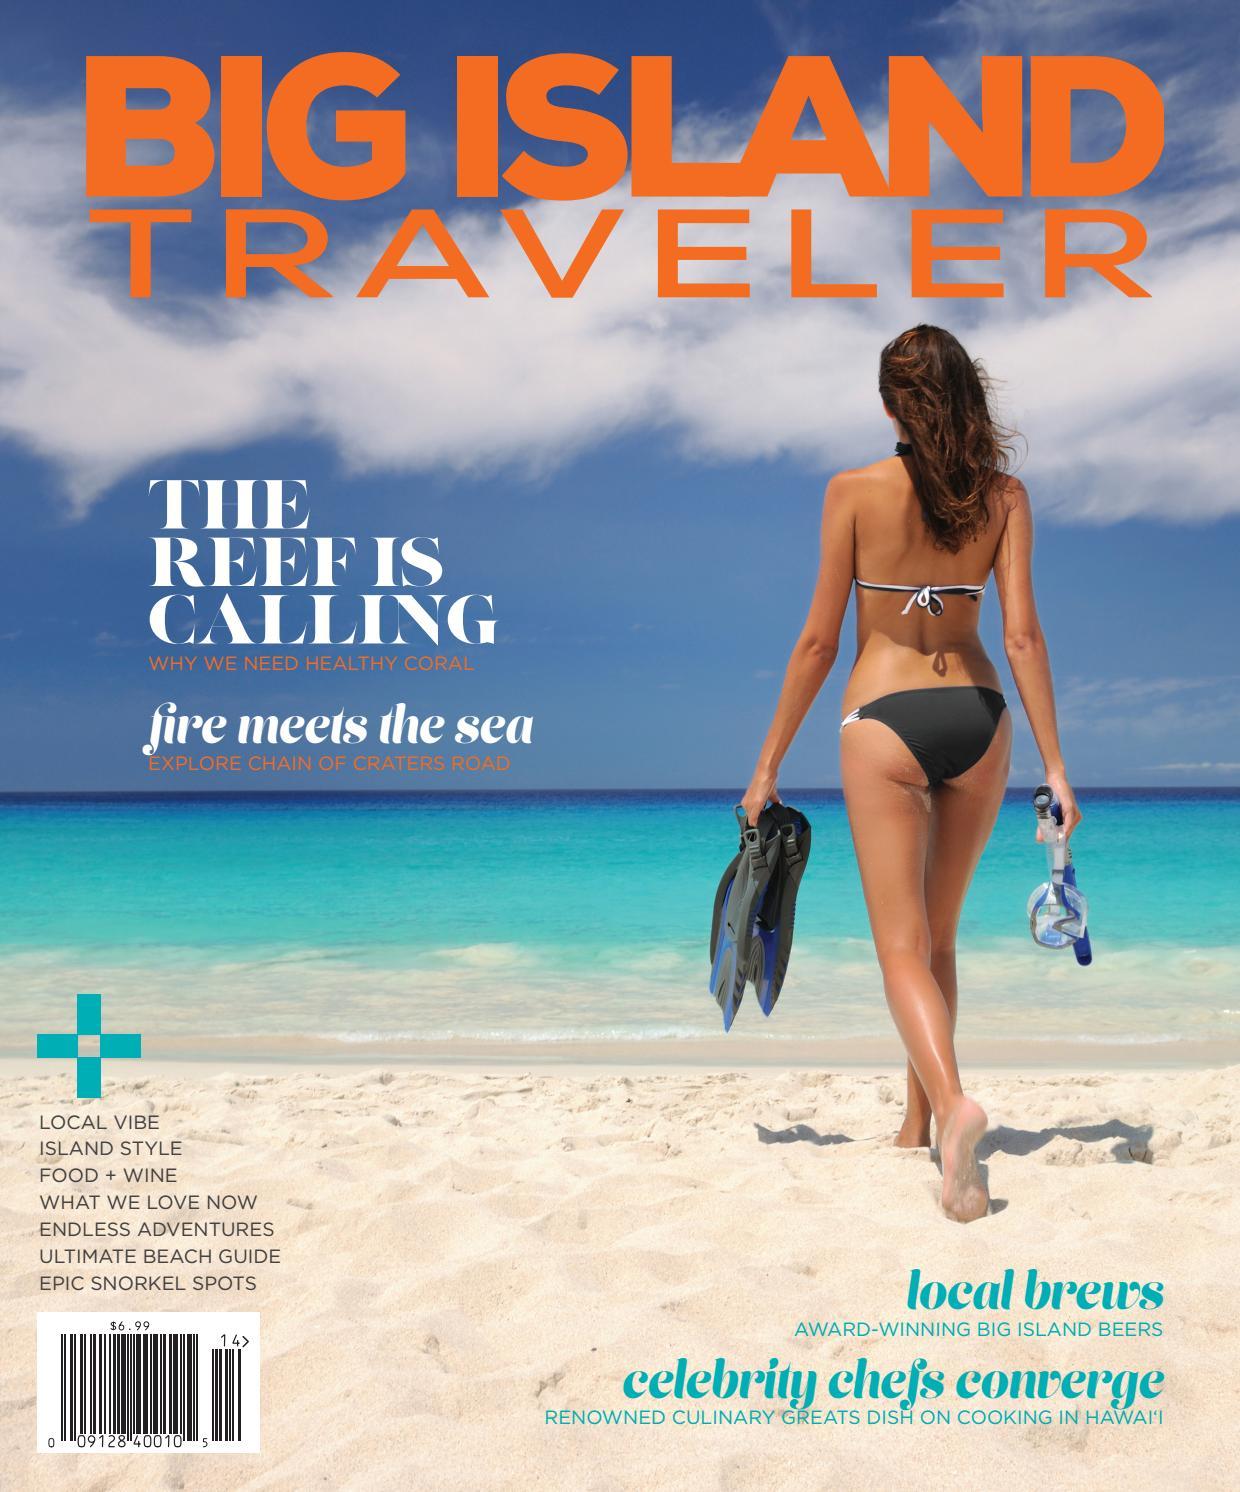 24b69276f5 Big Island Traveler by Traveler Media - issuu